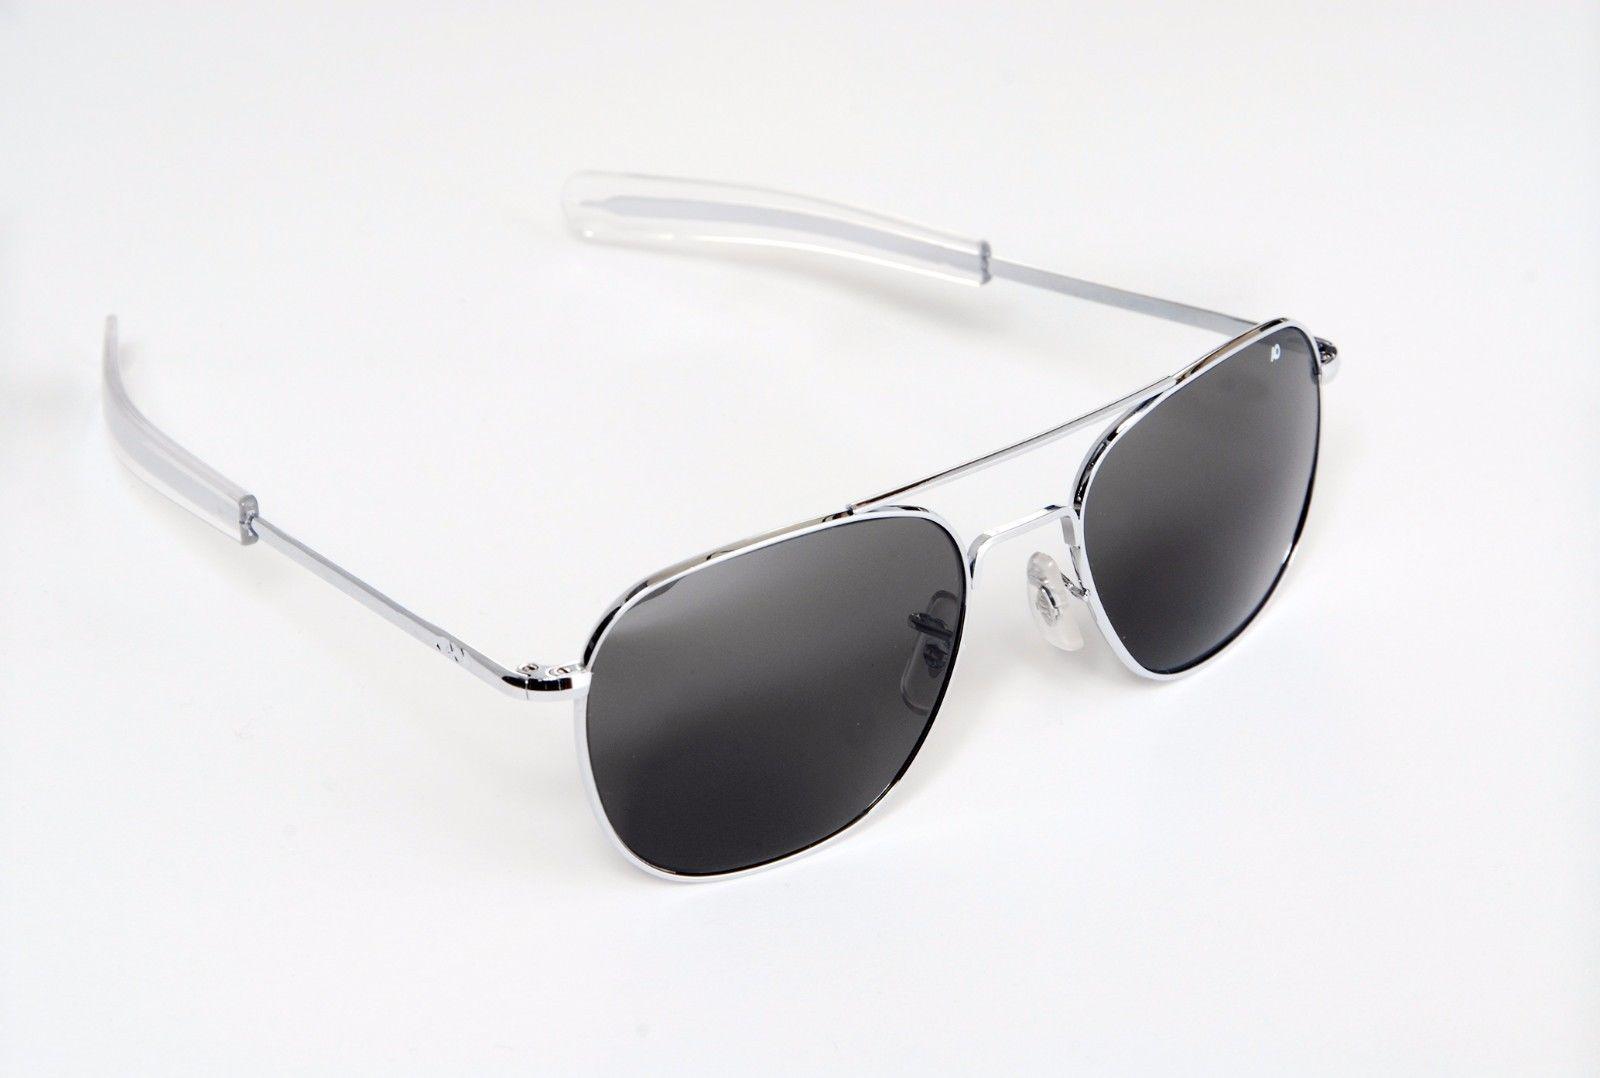 1bb9bb8dfa AO Eyewear Original Pilot Sunglasses Silver Frames OPT-0301-52